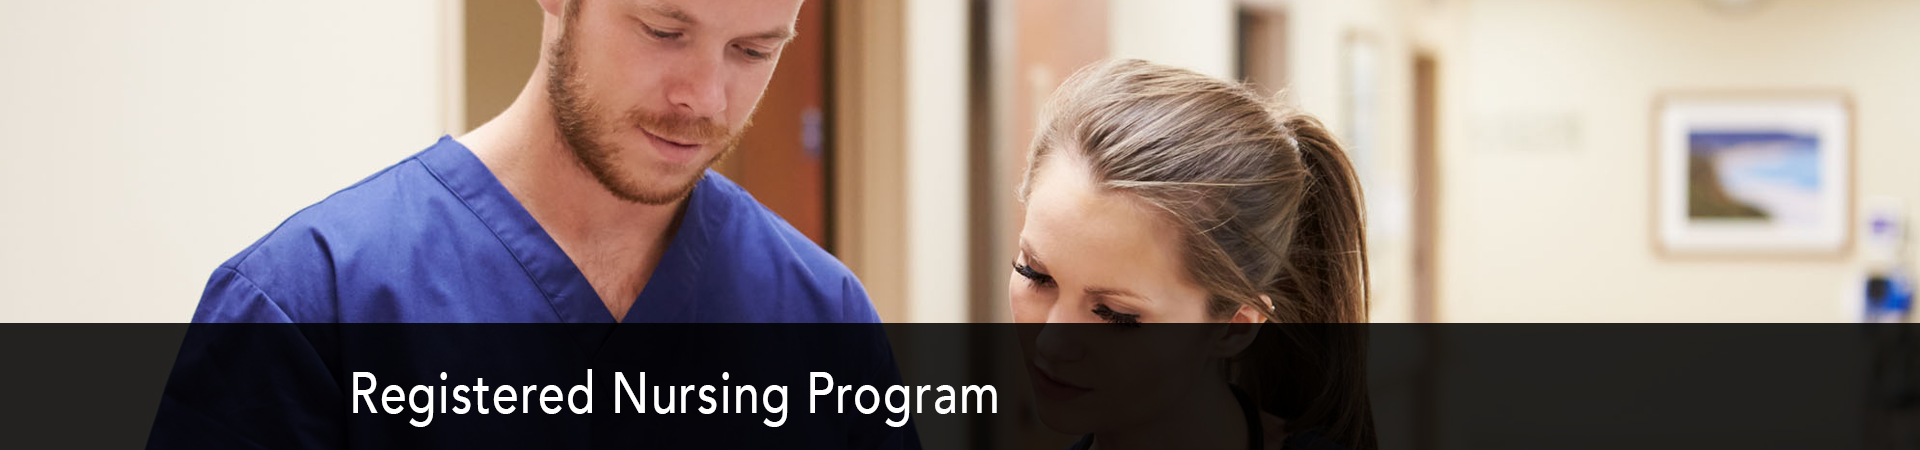 Explore the Registered Nursing Program at NC